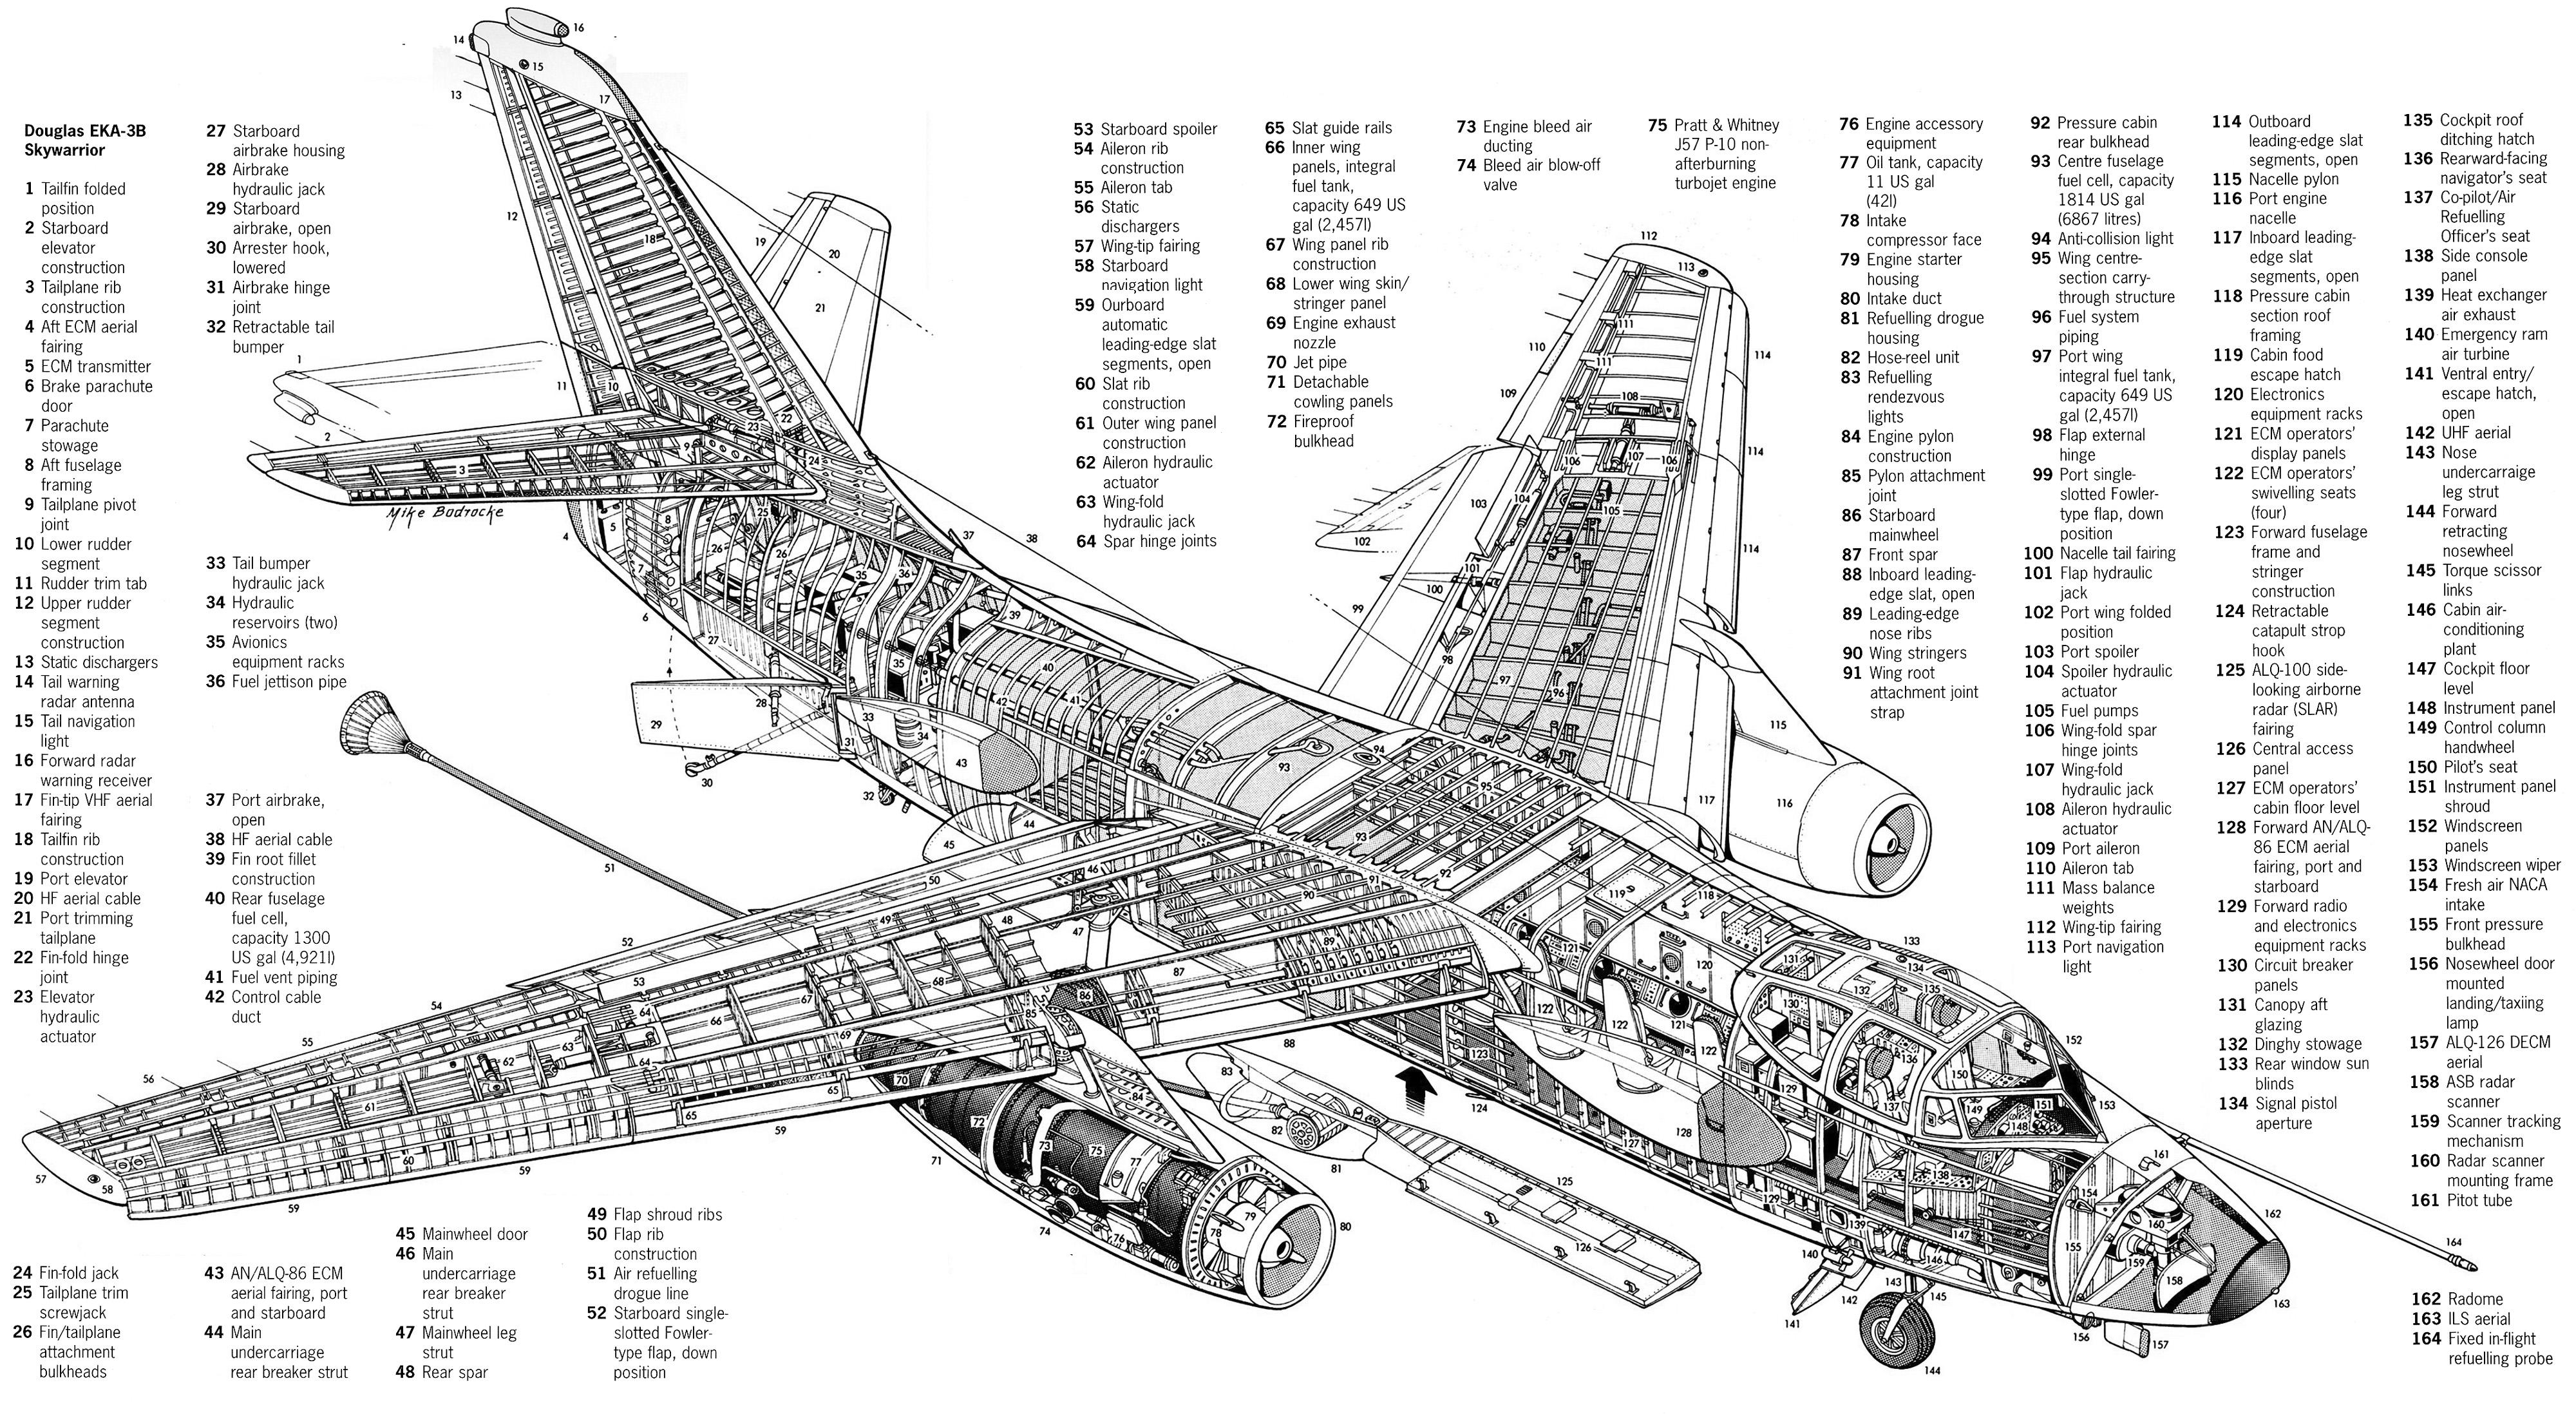 Douglas Eka 3b Skywarrior By Mike Badrocke X